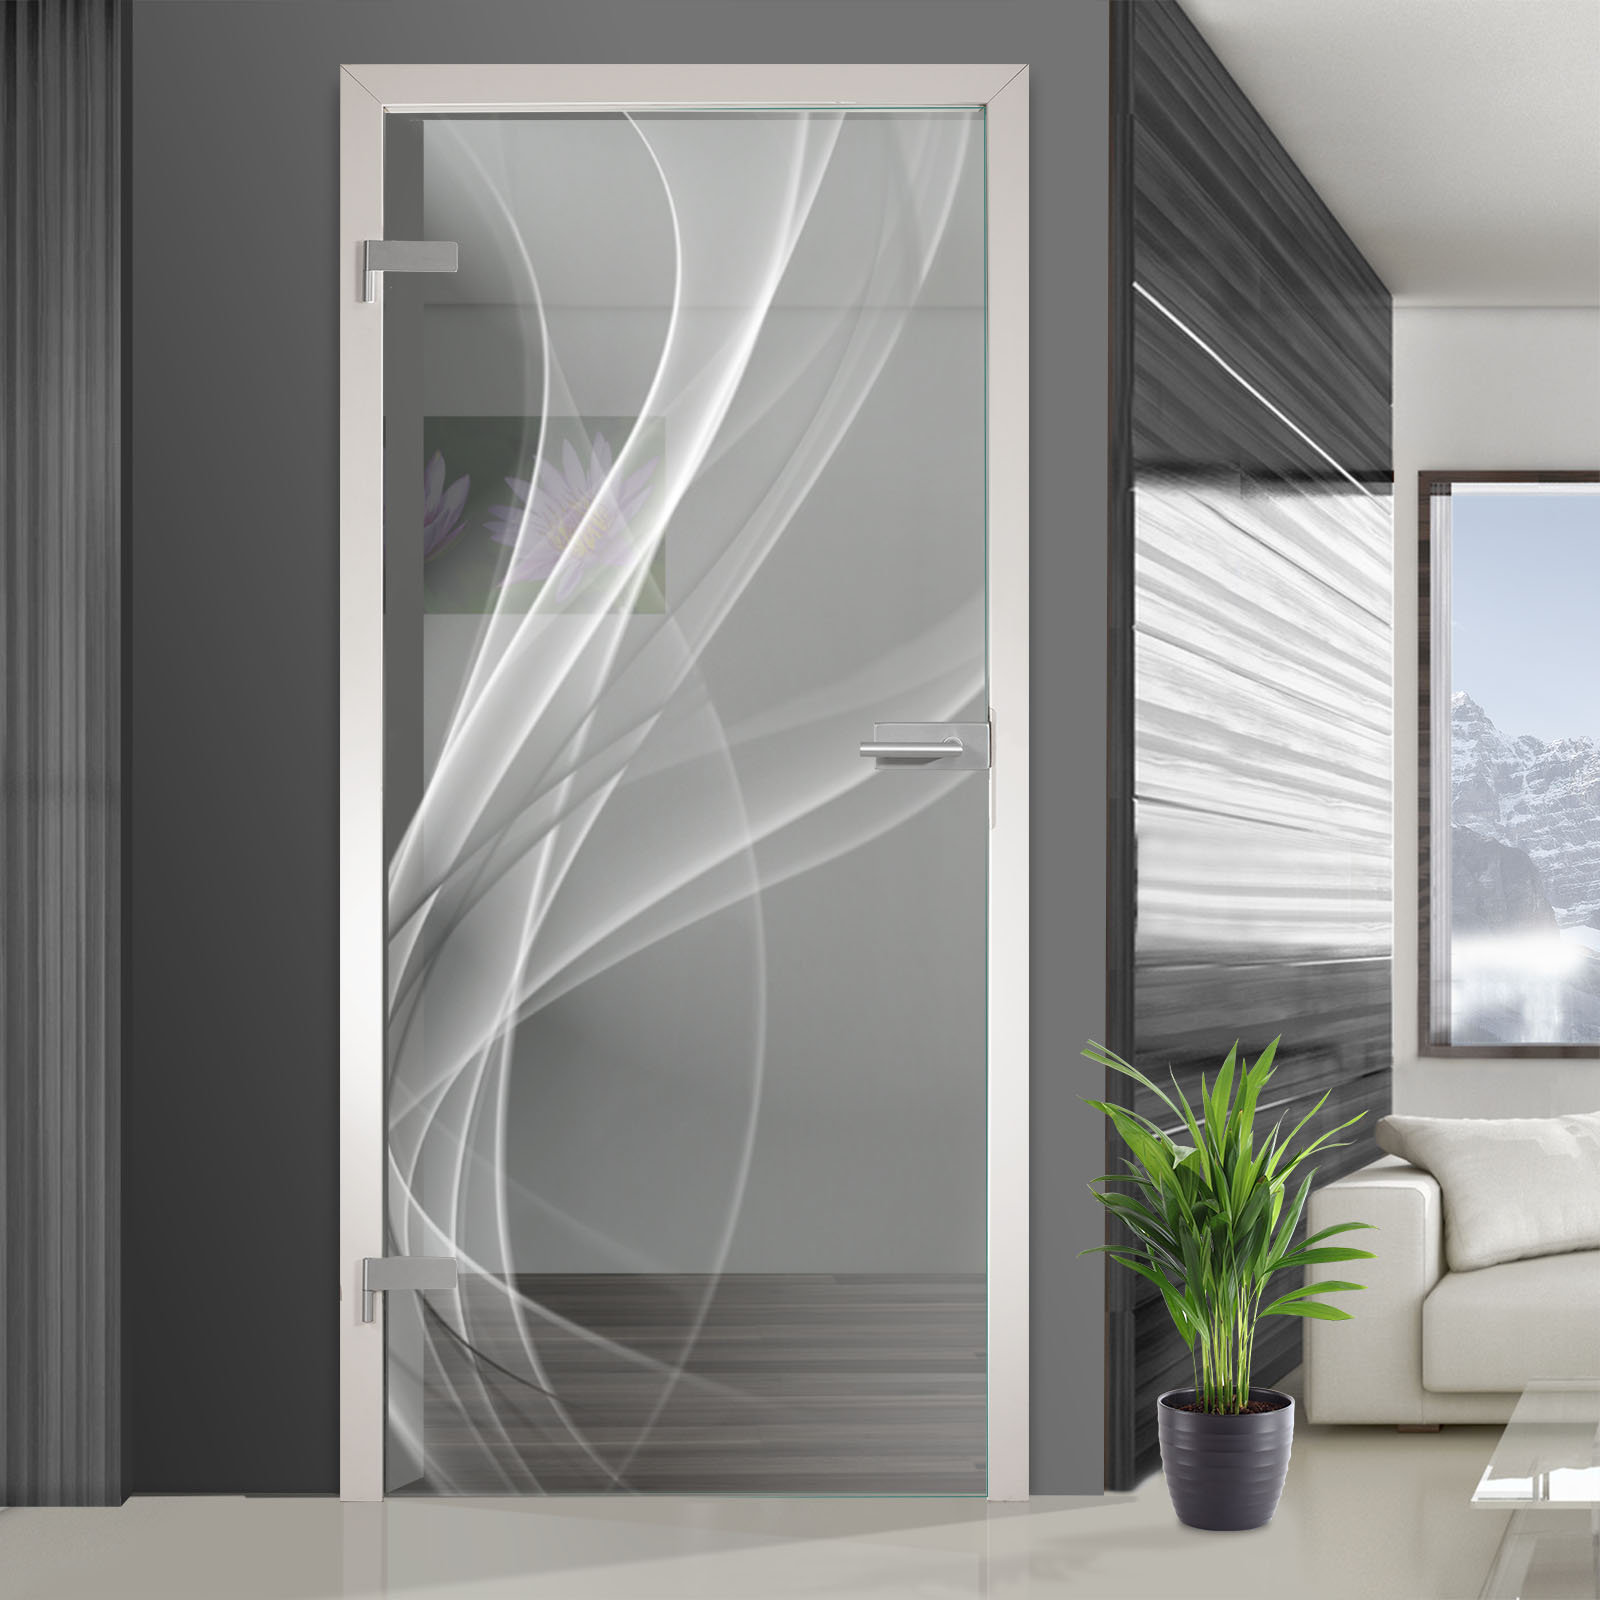 glast r ganzglast r lasergravur ld 004 f nebel direkt auf 8 mm esg ebay. Black Bedroom Furniture Sets. Home Design Ideas